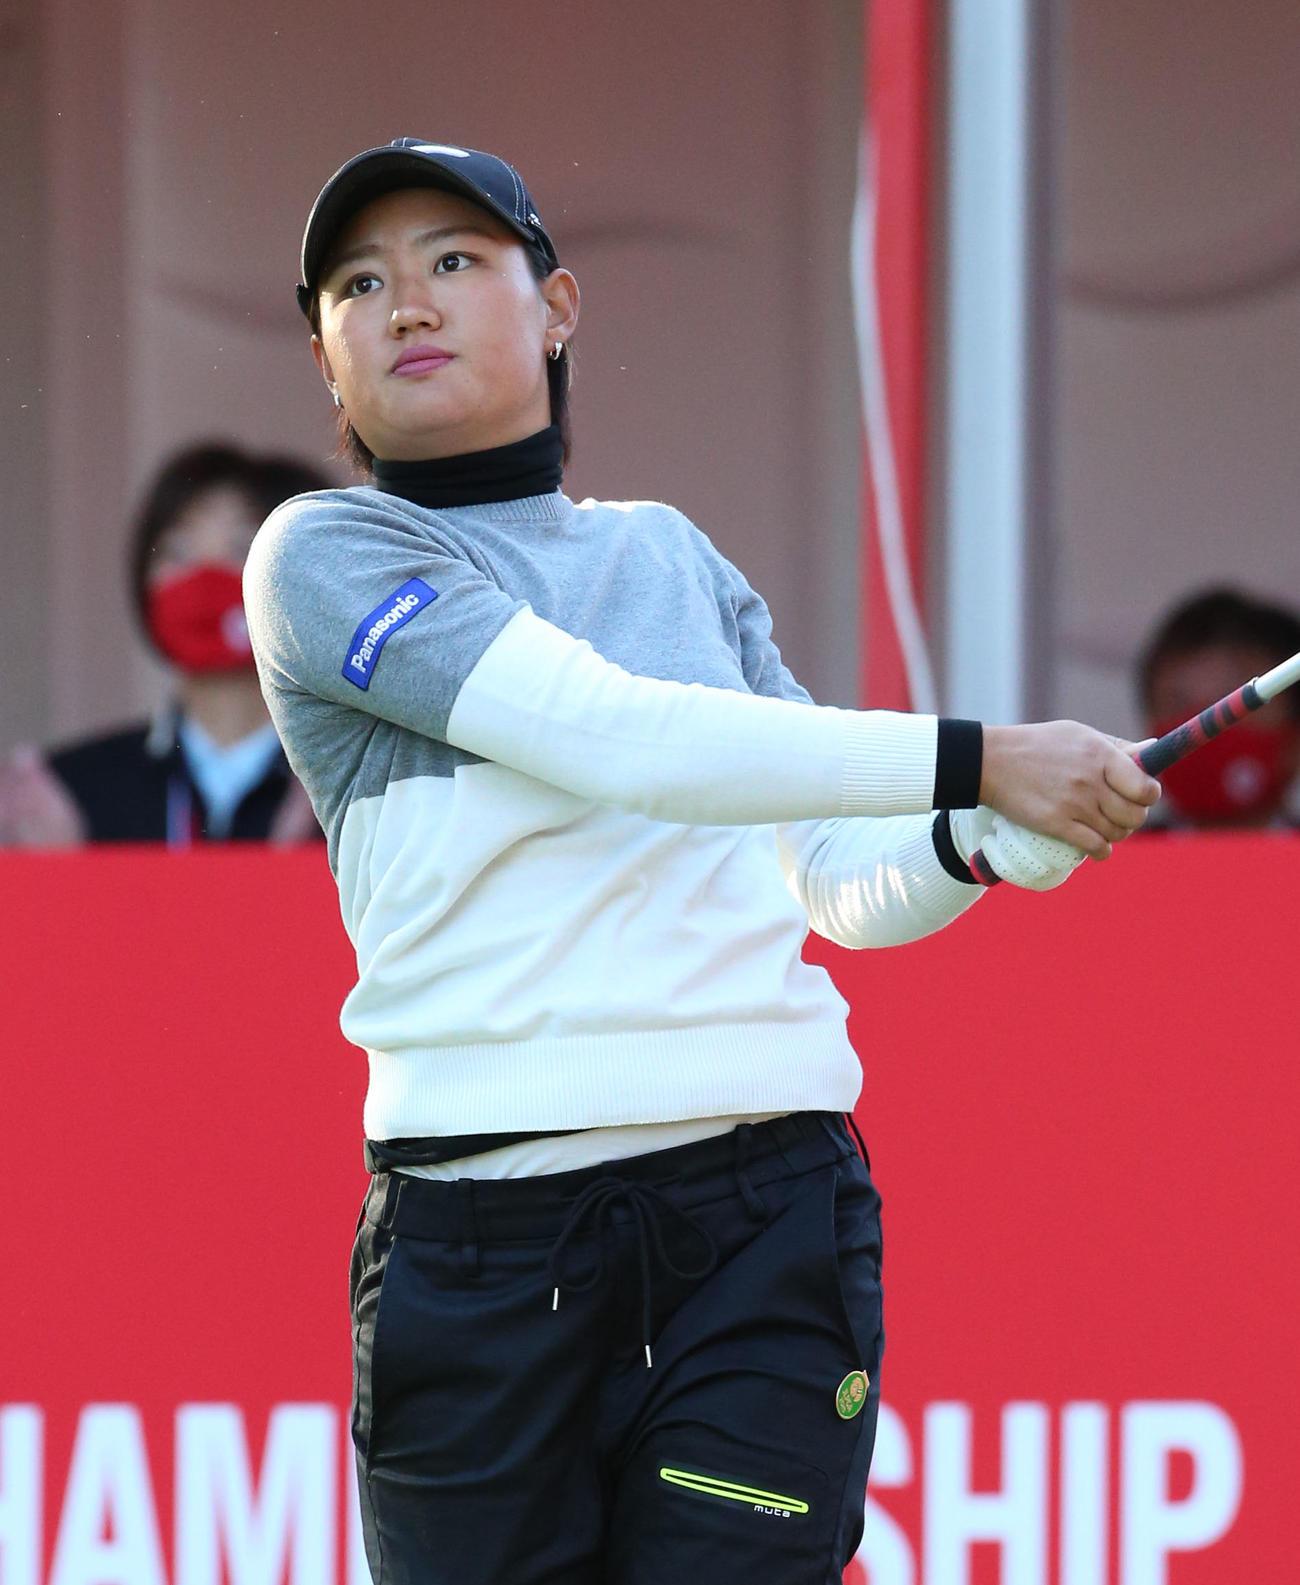 https://www.nikkansports.com/sports/golf/news/img/202011280000096-w1300_1.jpg